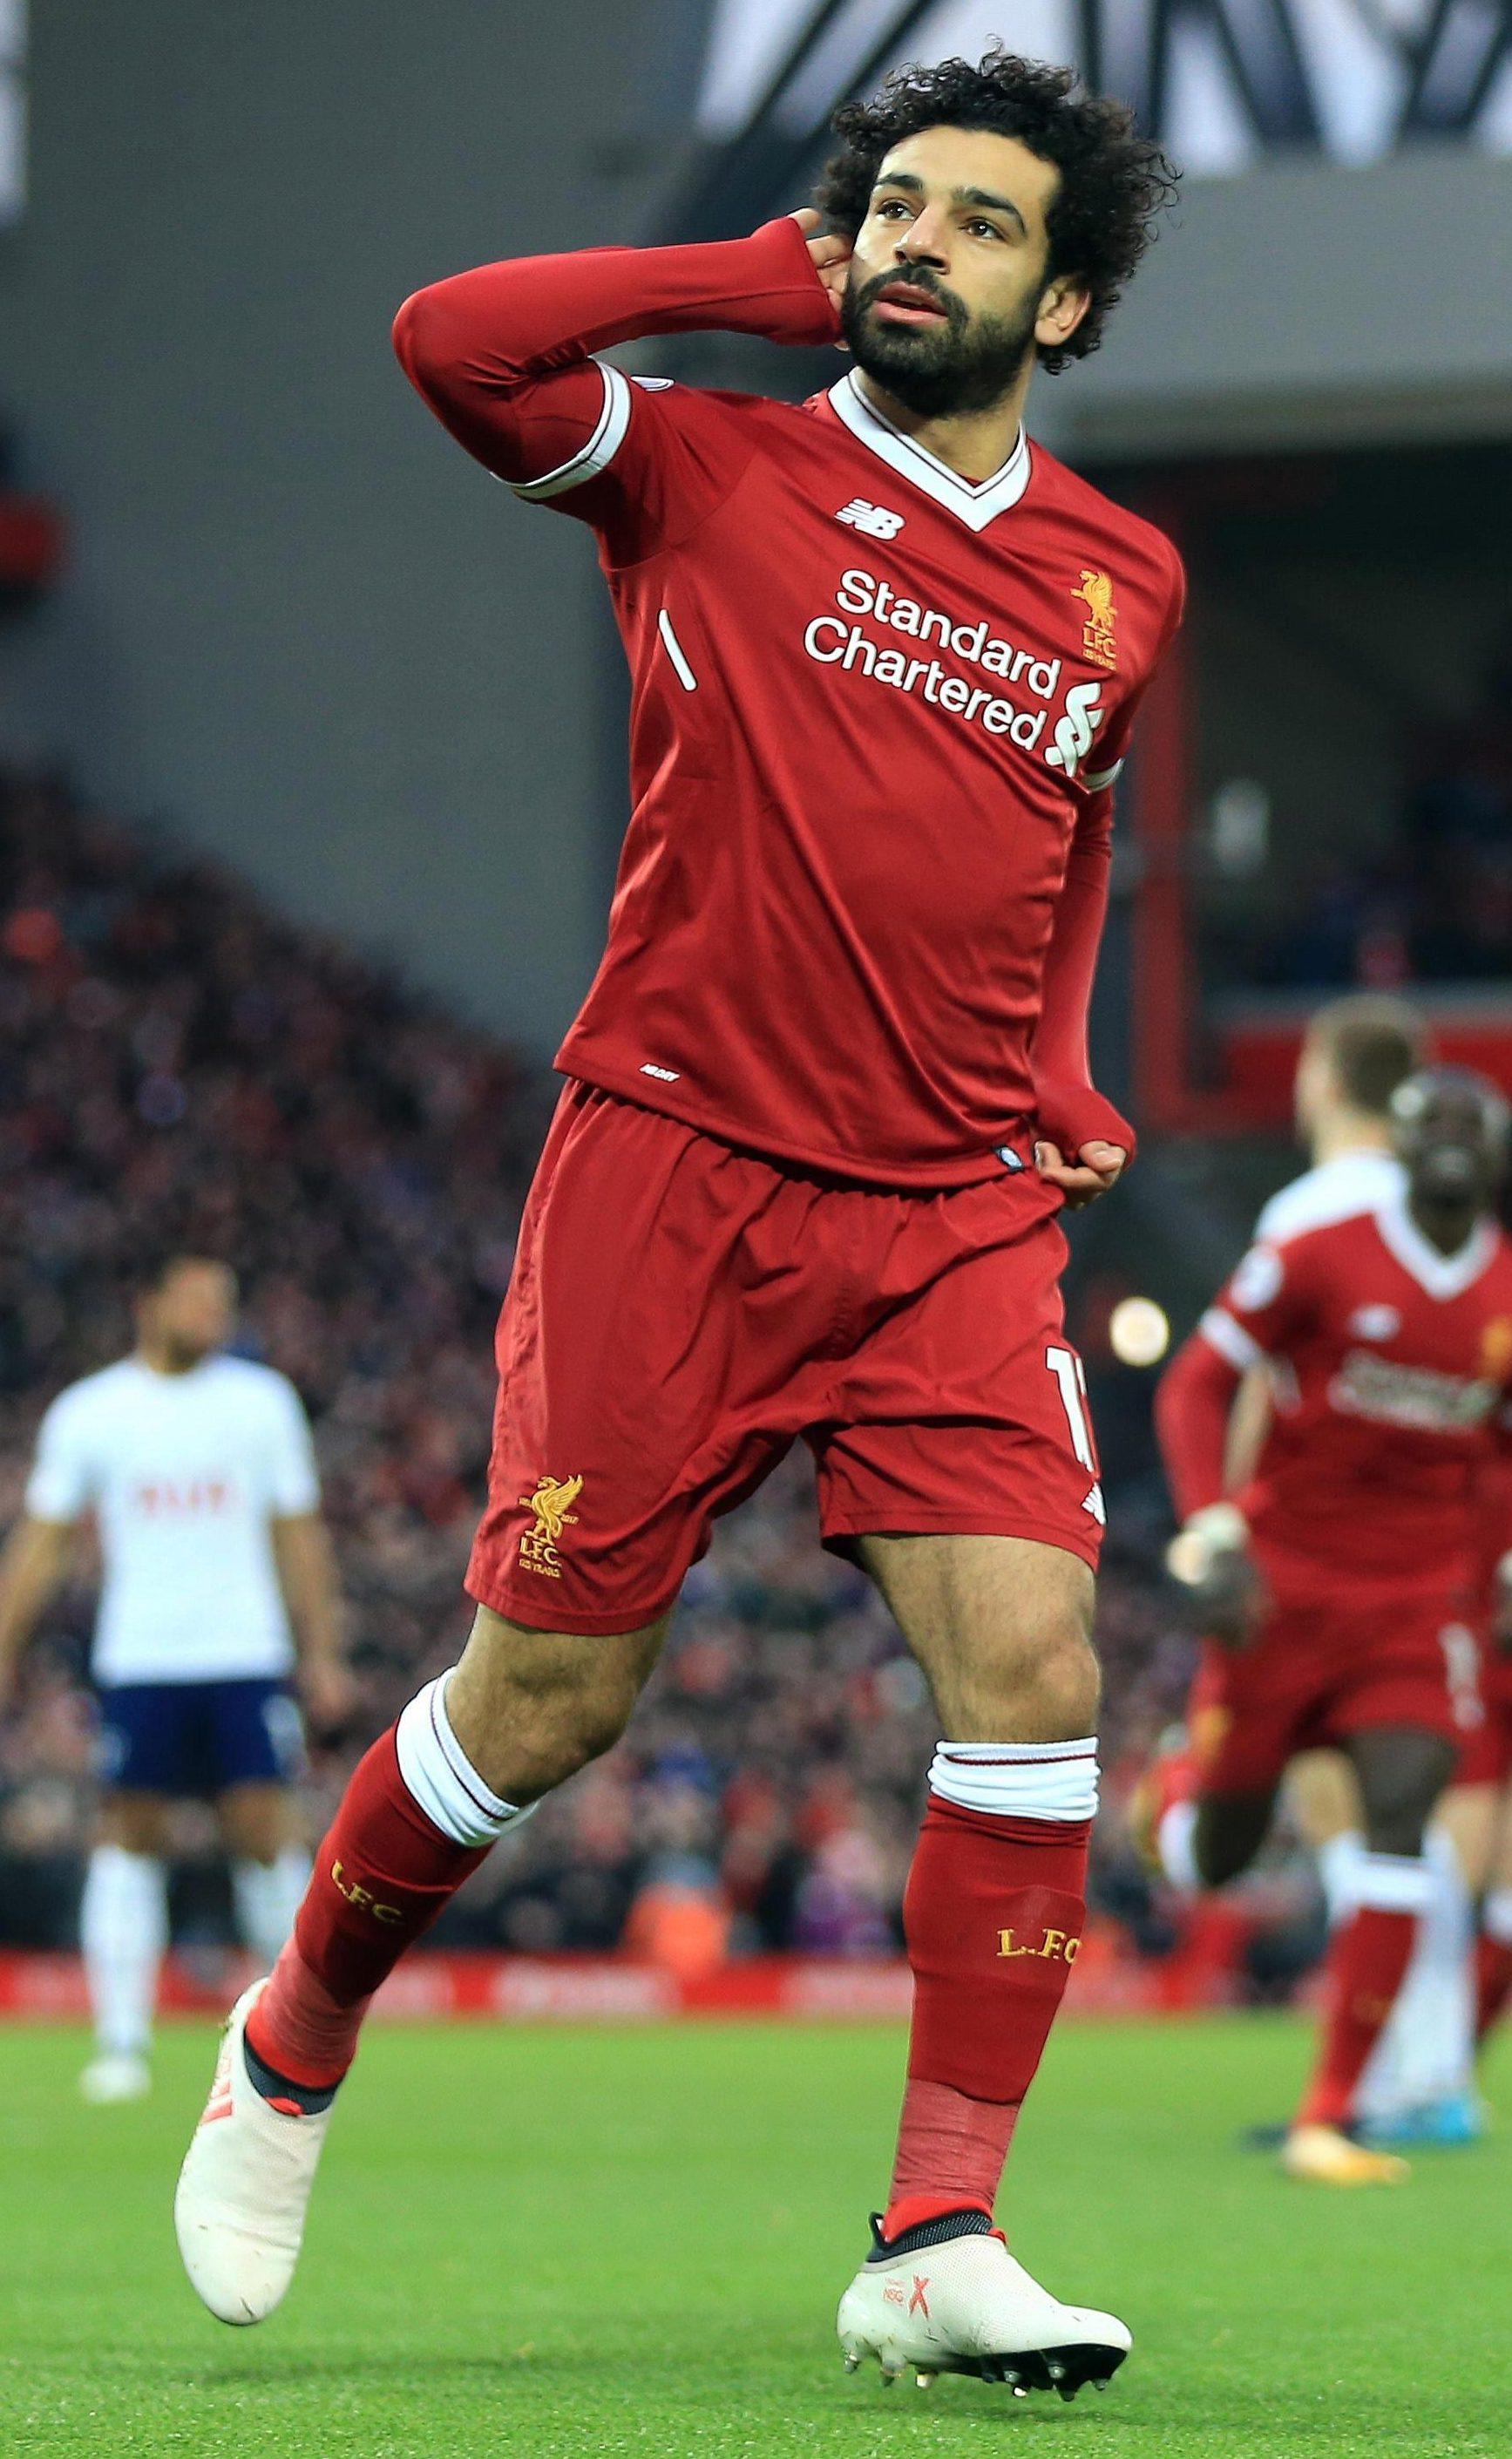 Liverpool striker Mo Salah has already scored 31 goals this season